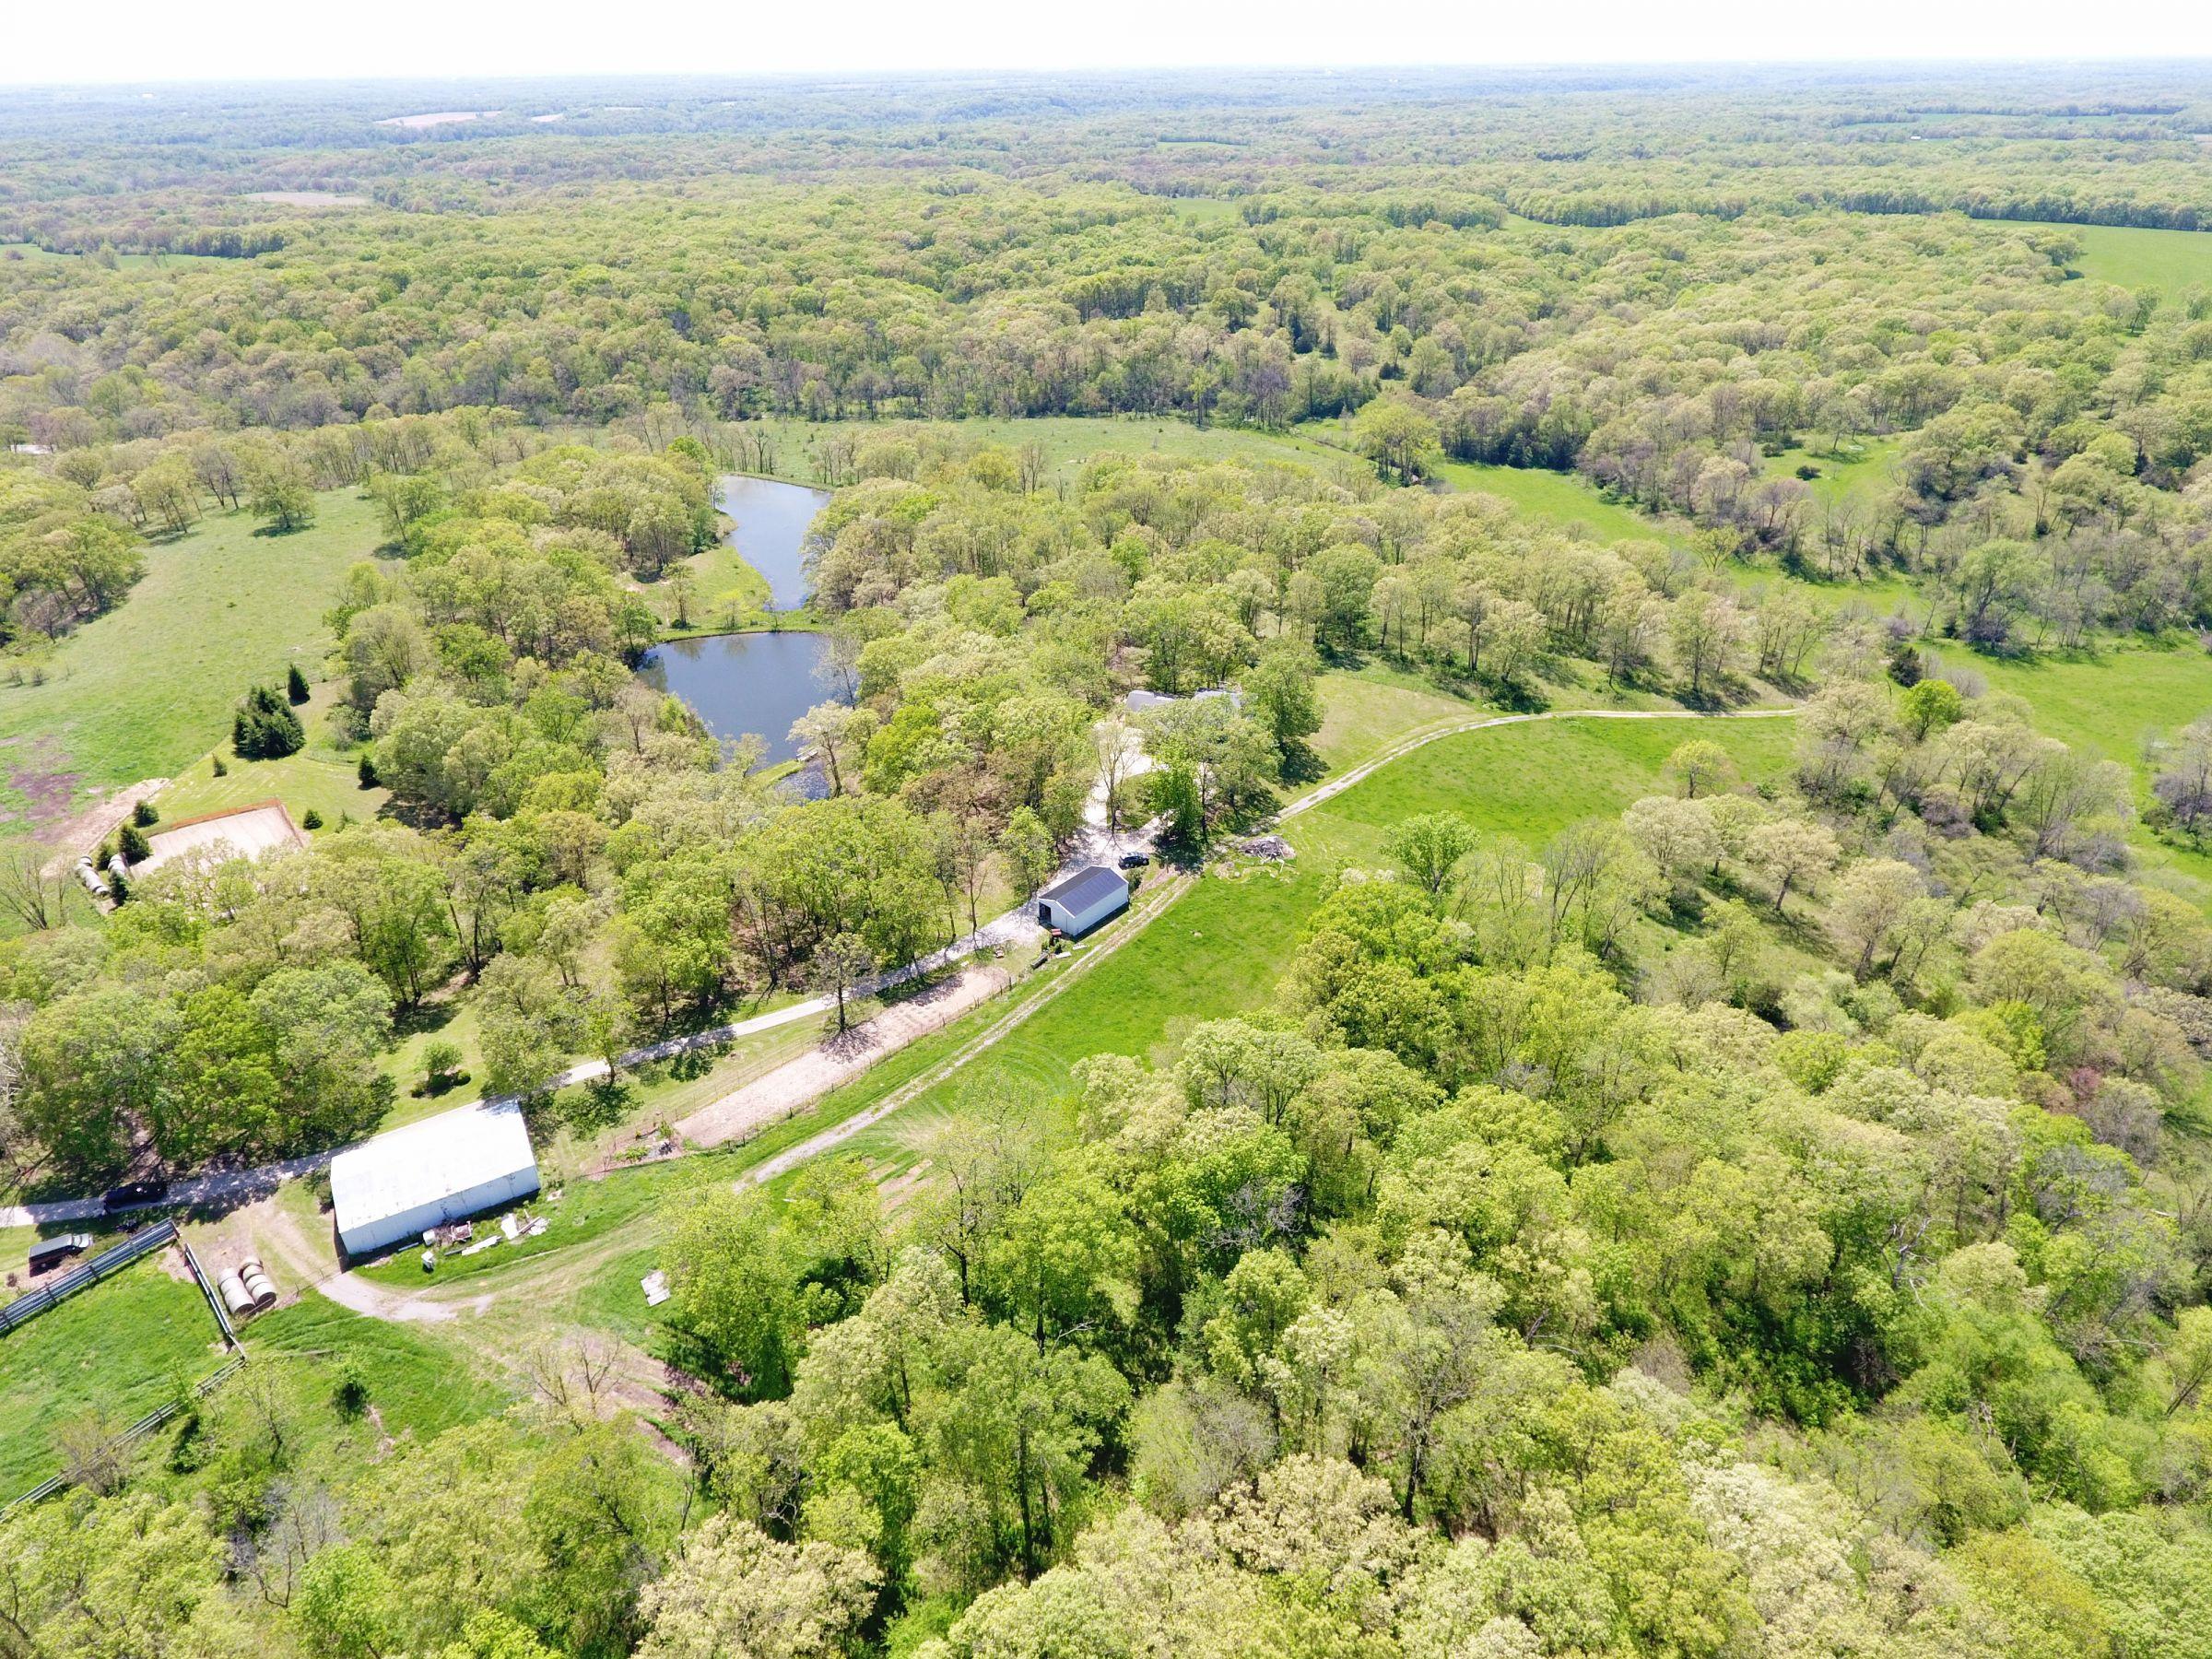 land-lee-county-iowa-340-acres-listing-number-15649-12-2021-07-21-185200.jpg